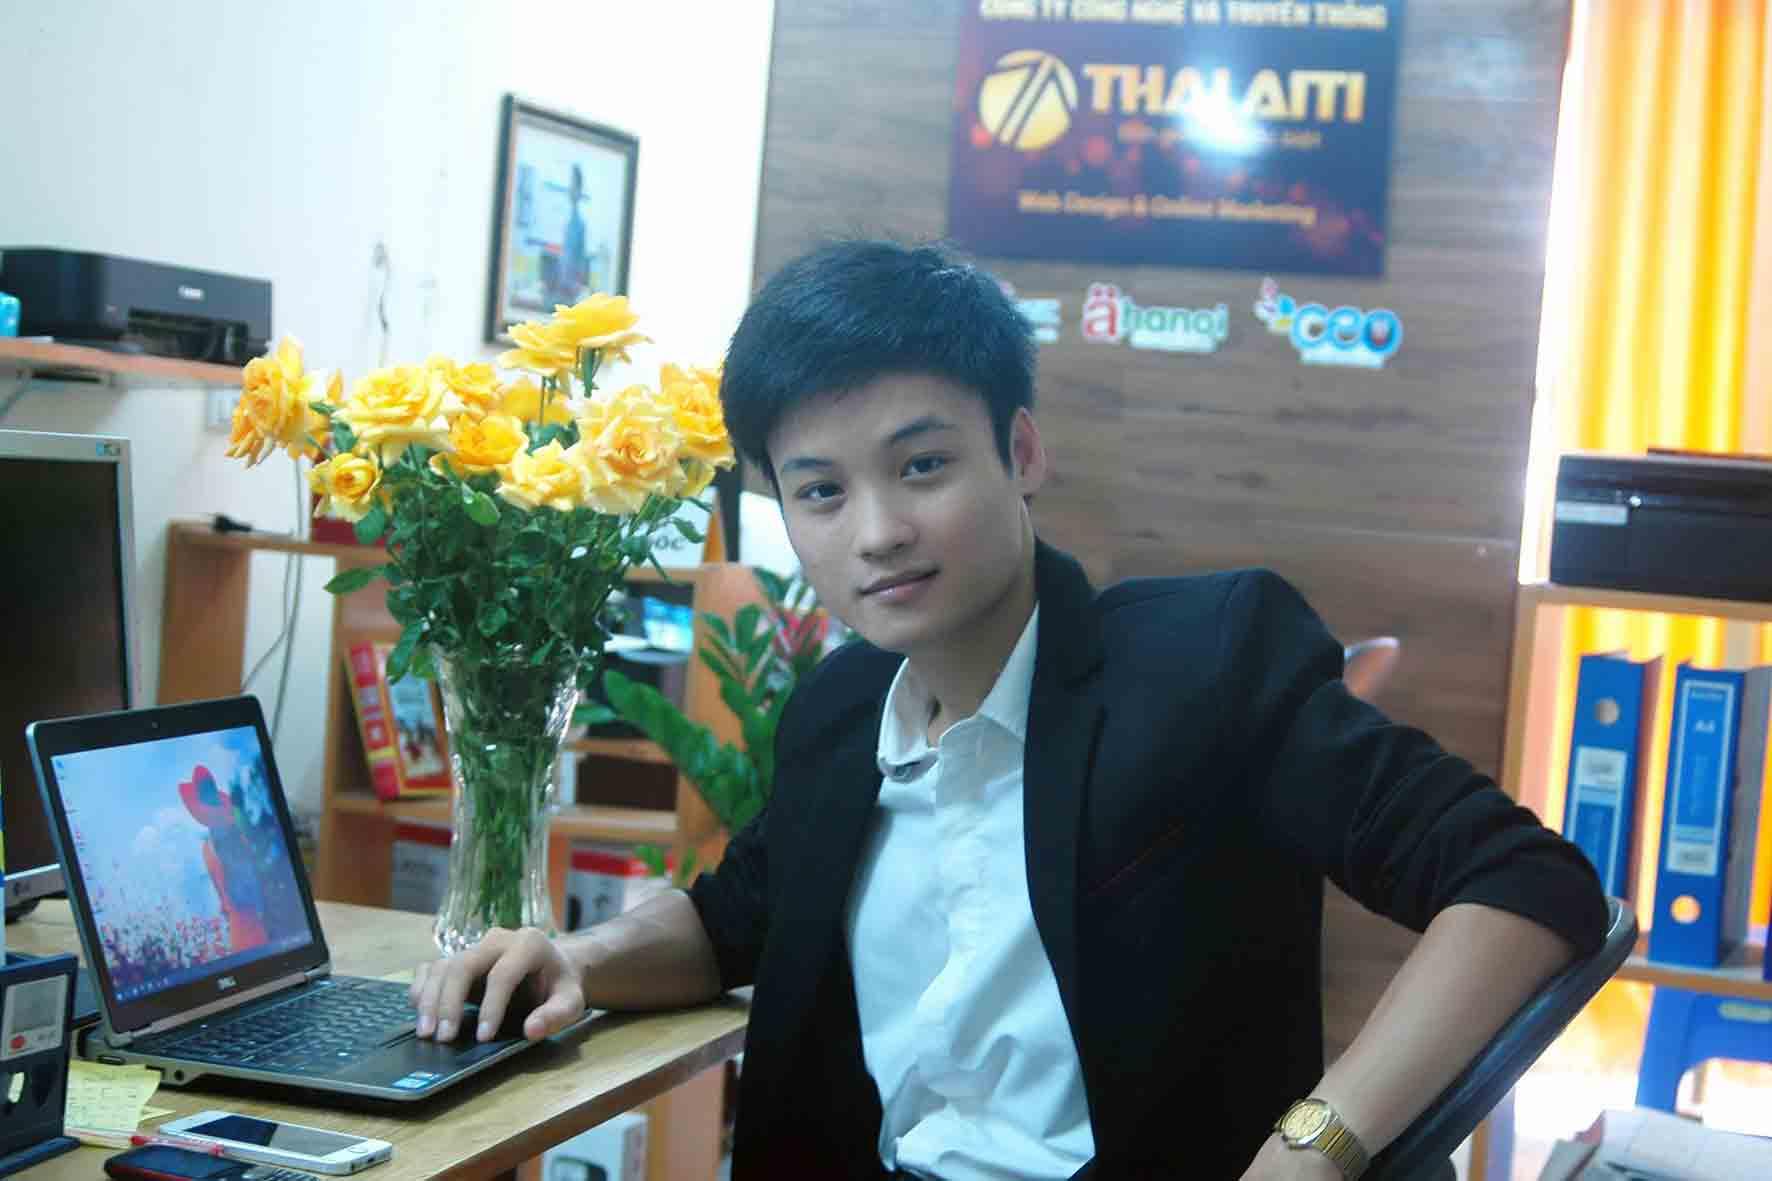 thaiaiti studio chup anh 4